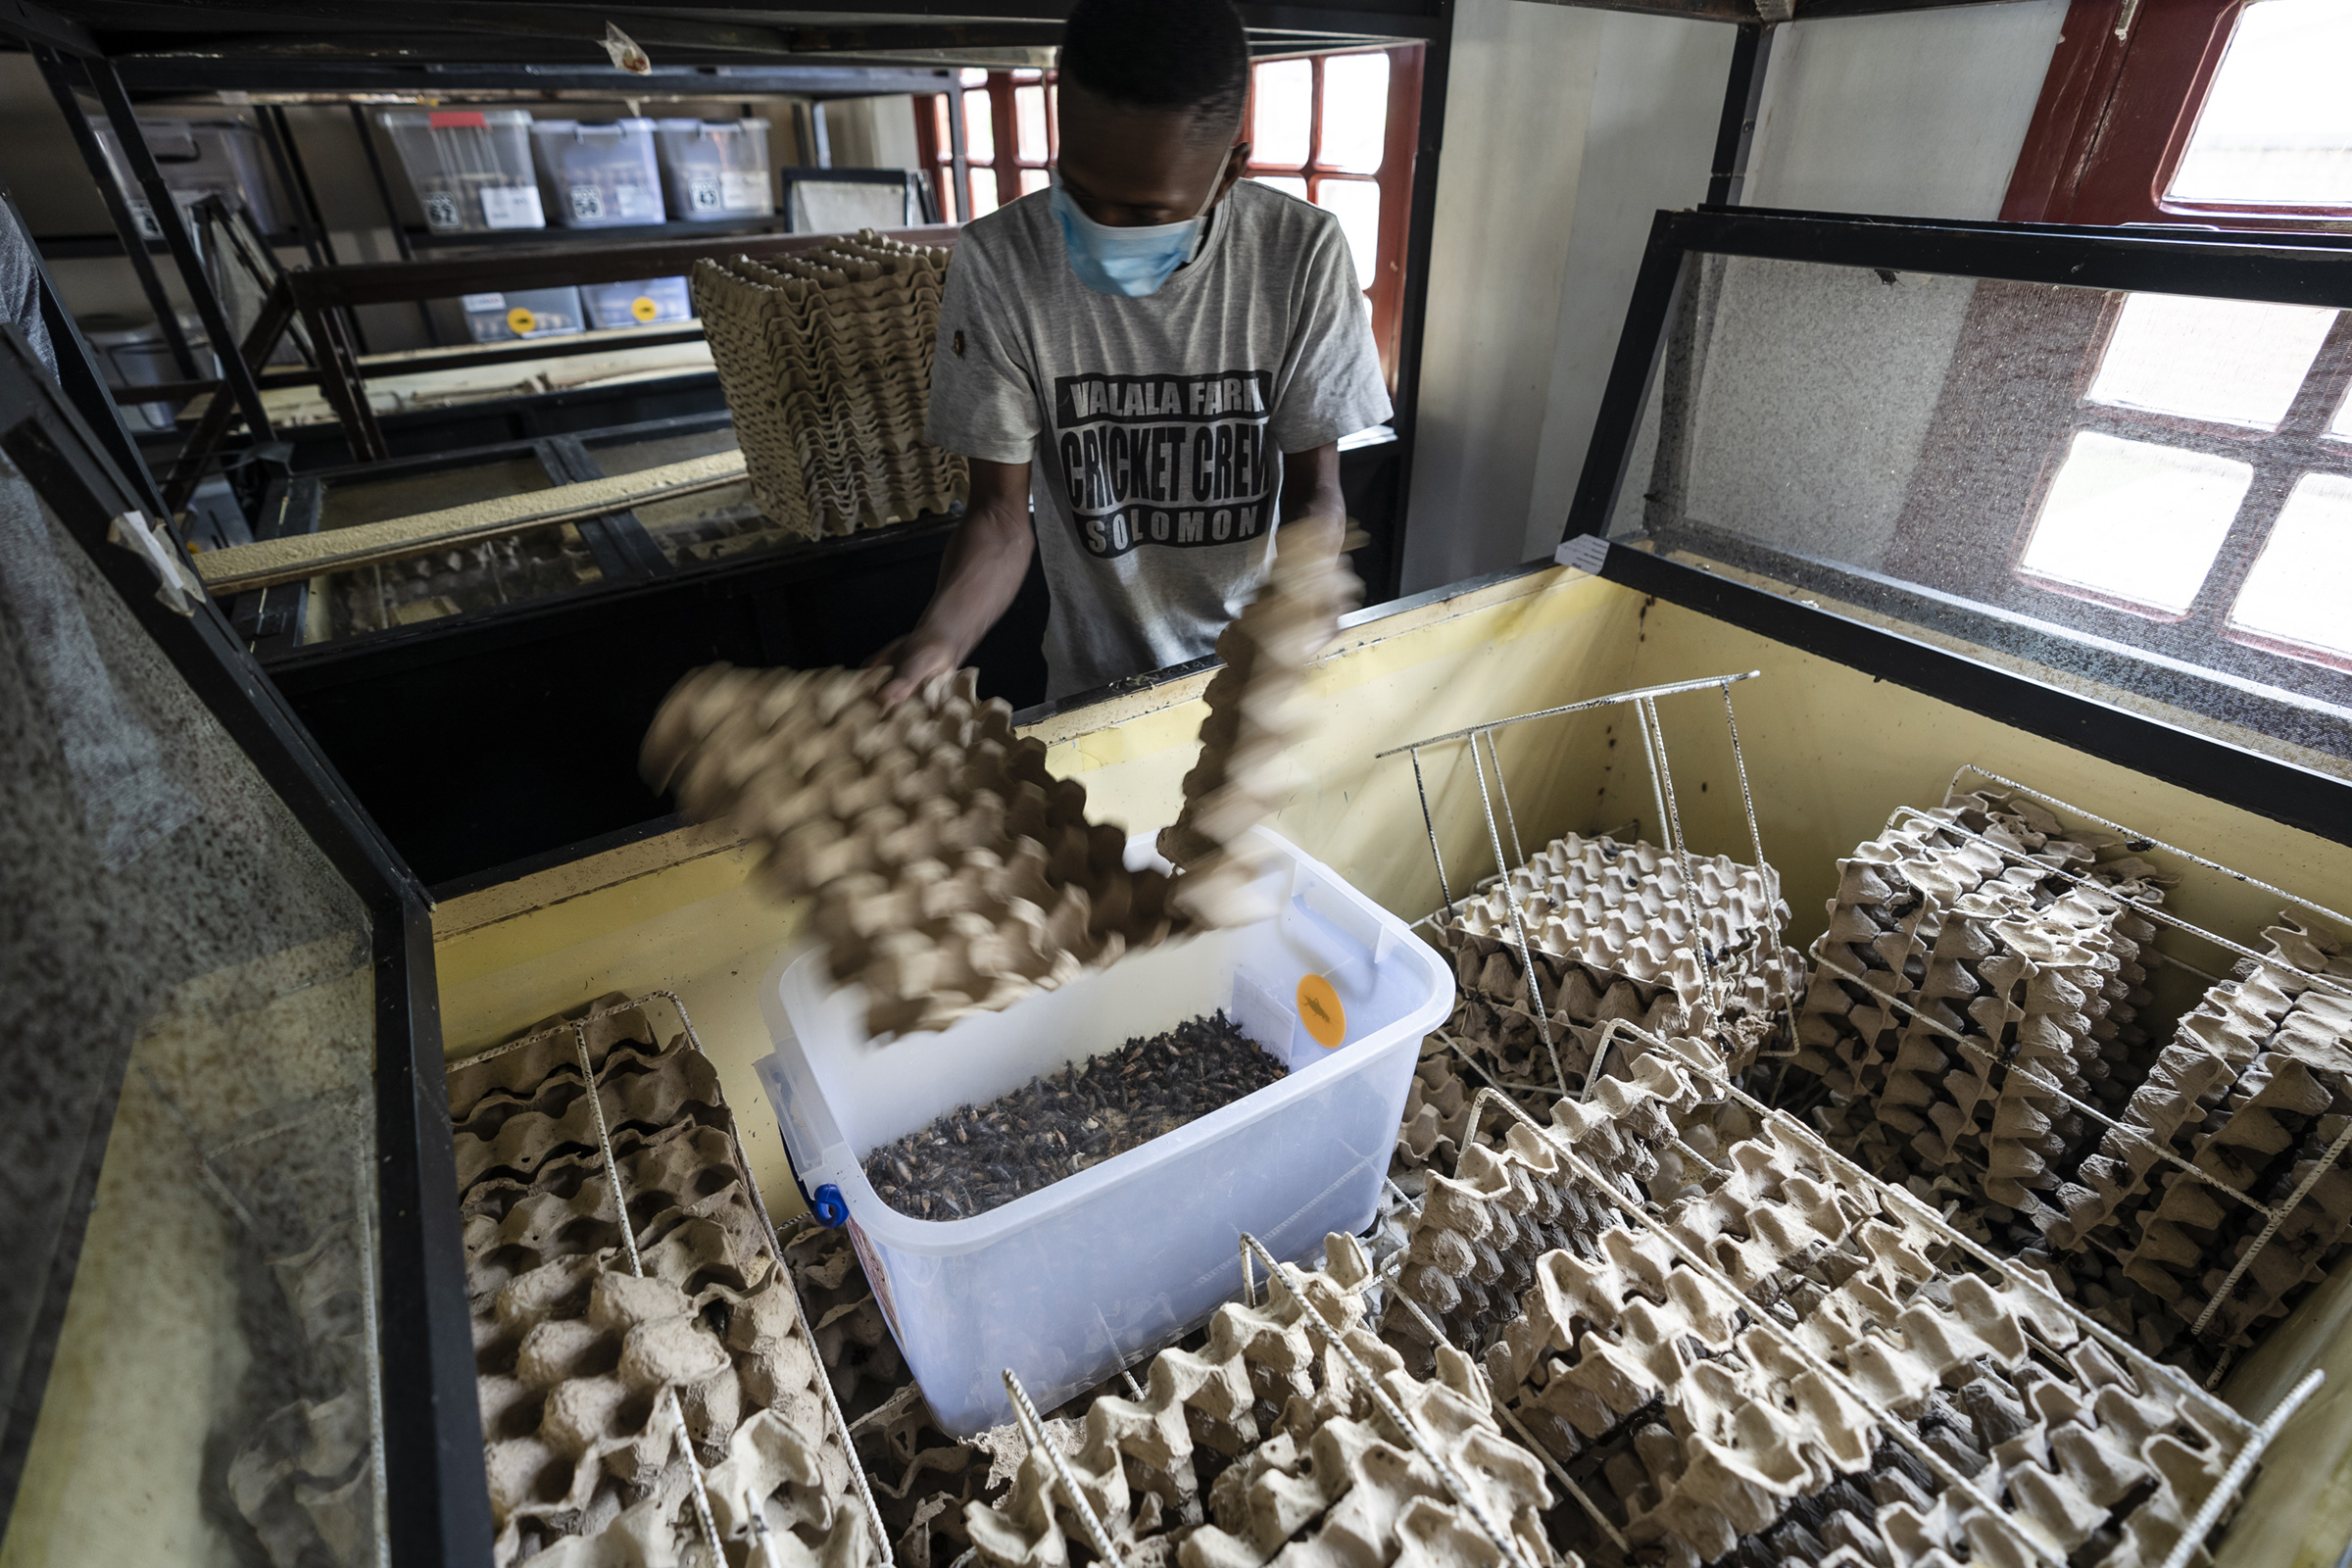 A staff worker harvesting mature adult crickets at Valala Farms in Antananarivo, Madagascar on Nov. 20, 2019.